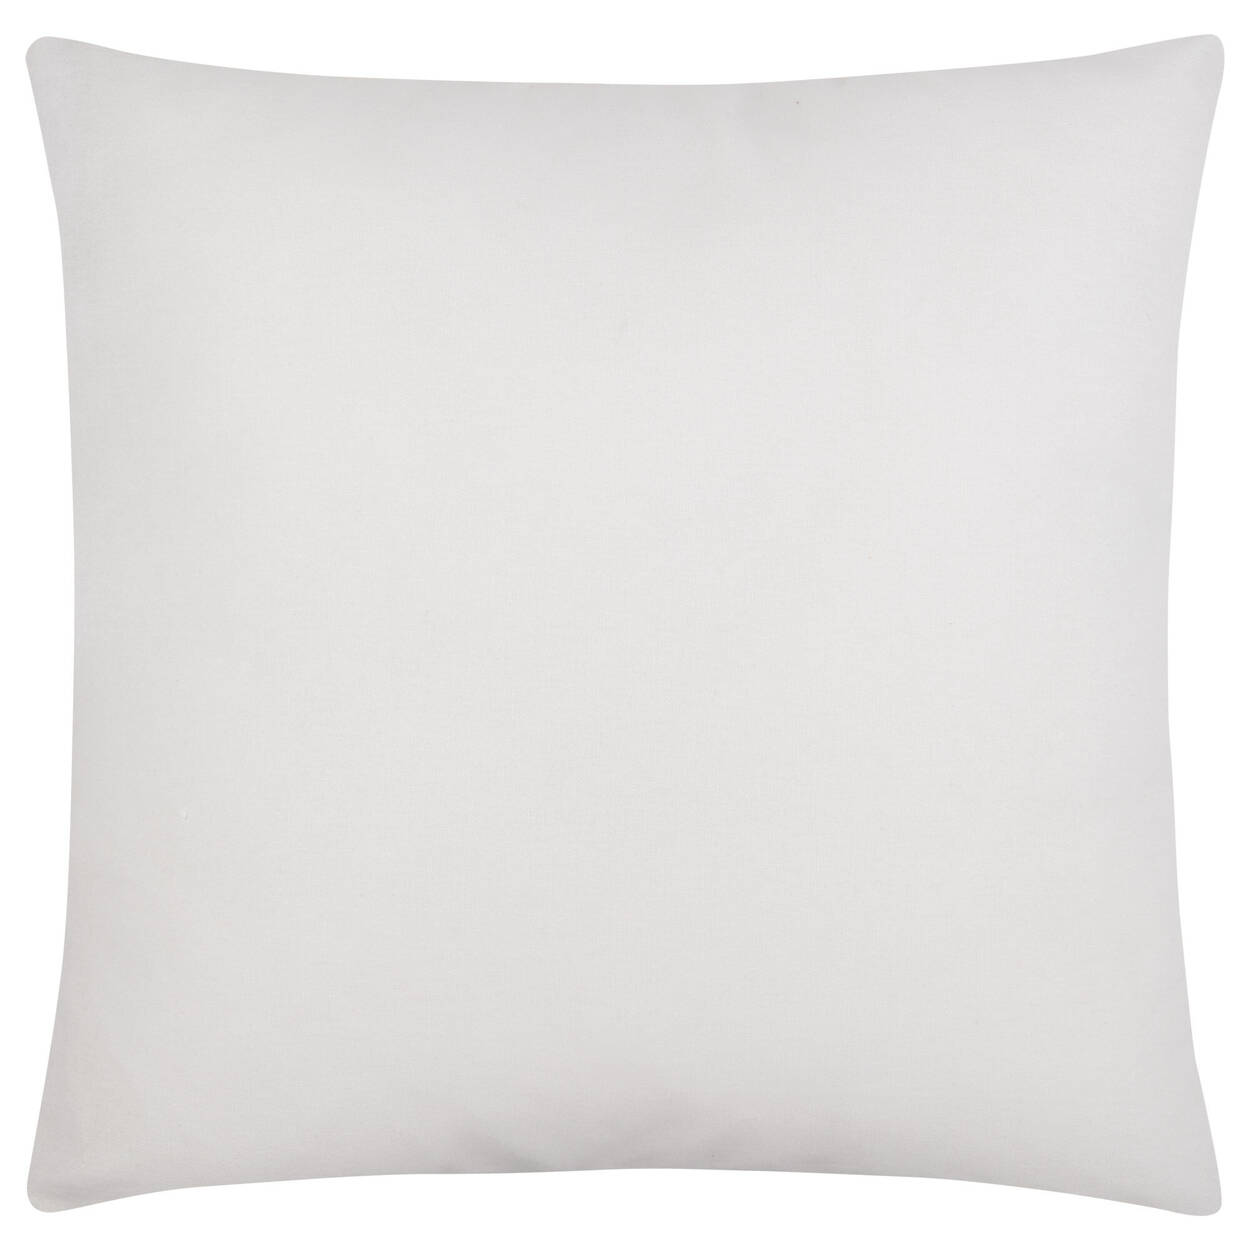 "Namaste Decorative Pillow Cover 18"" X 18"""